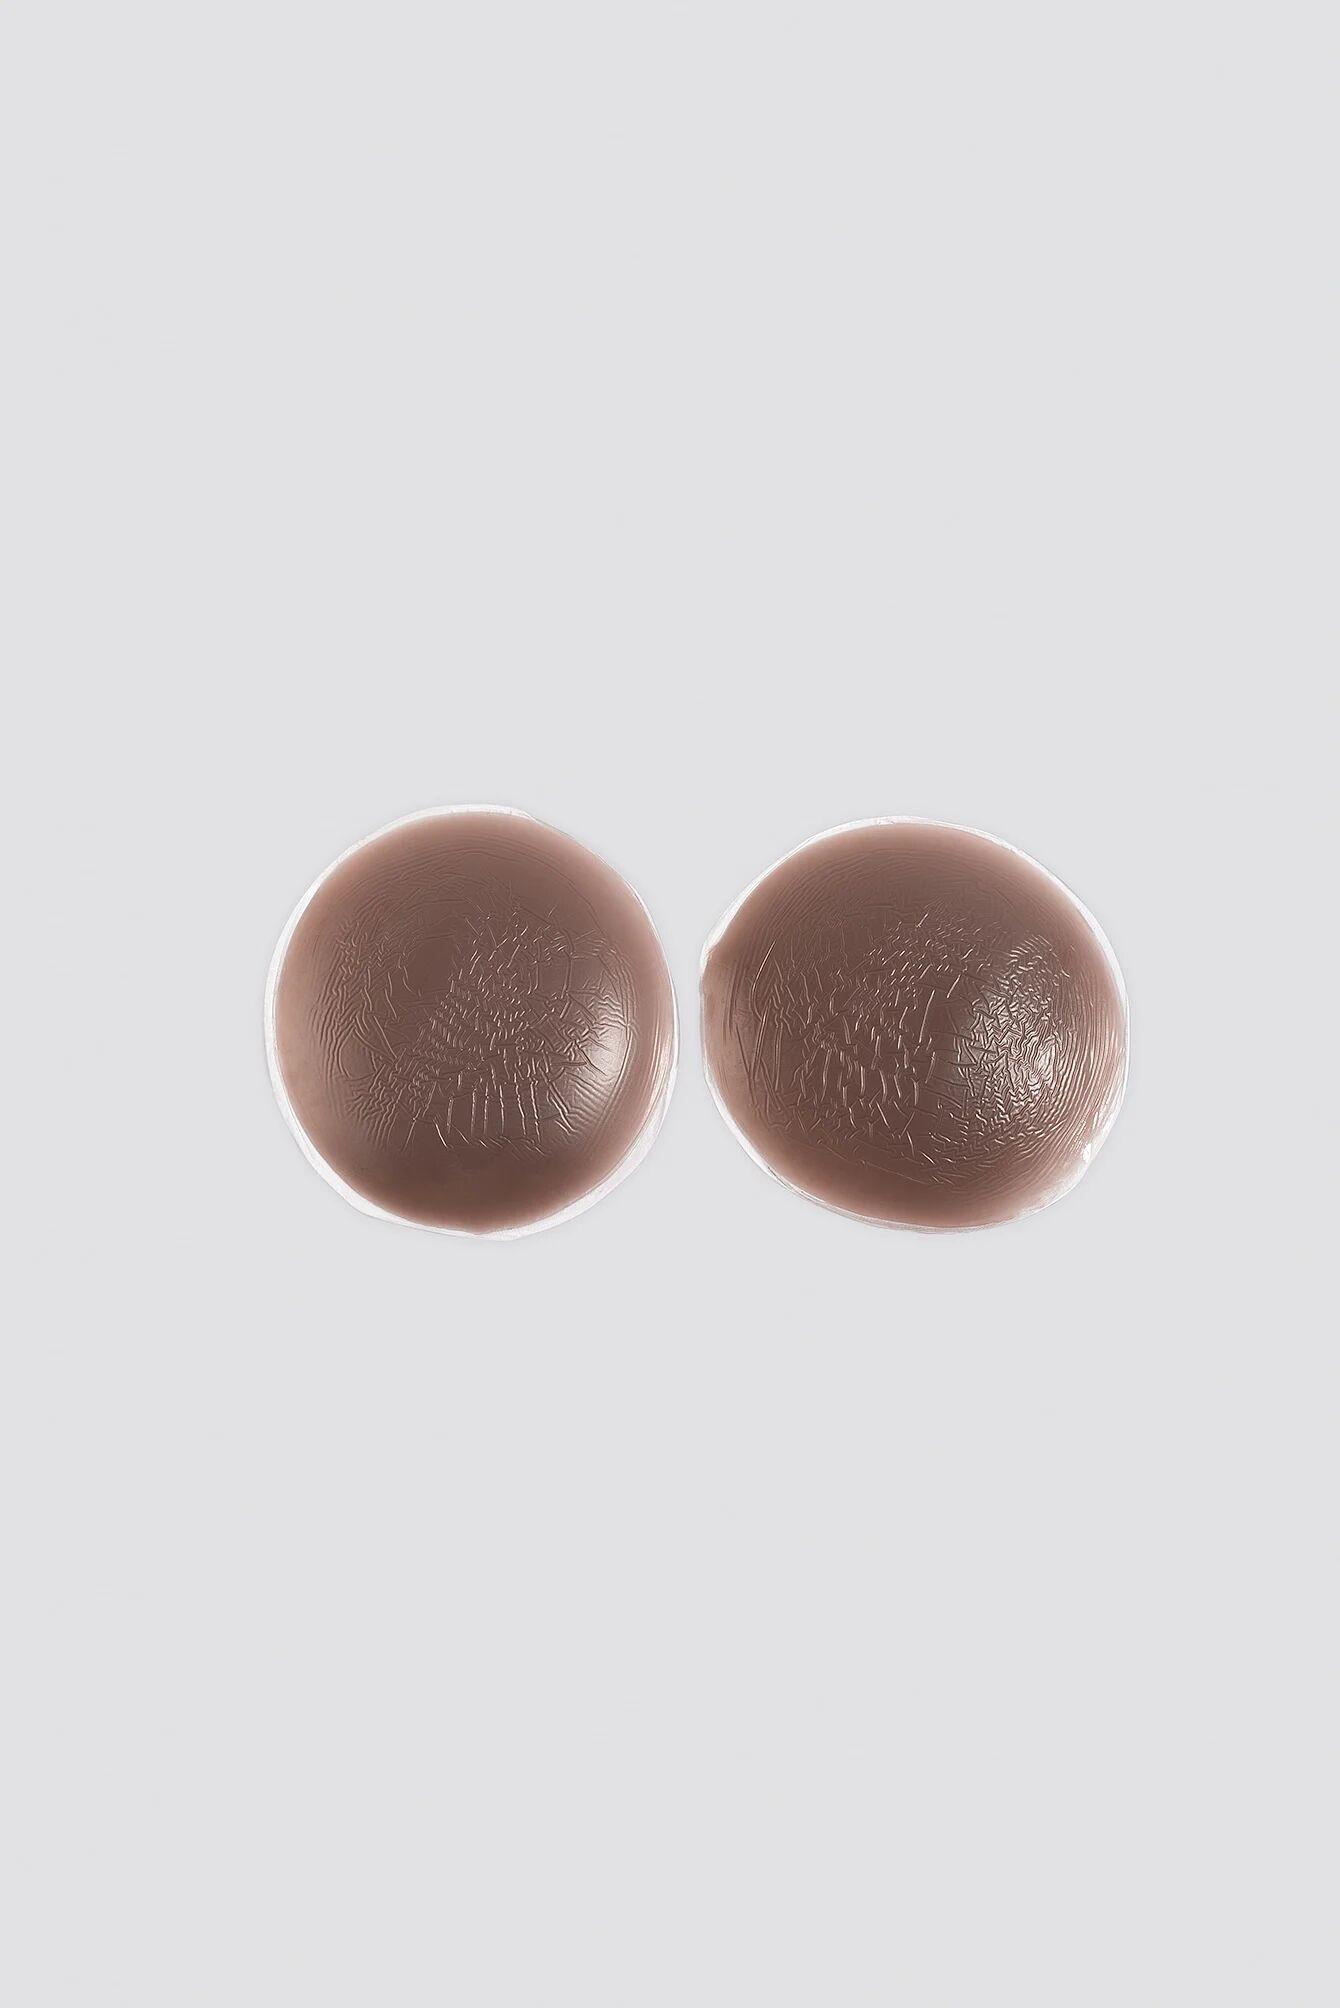 Freebra Silicone Nipple Covers - Beige  - Size: One Size